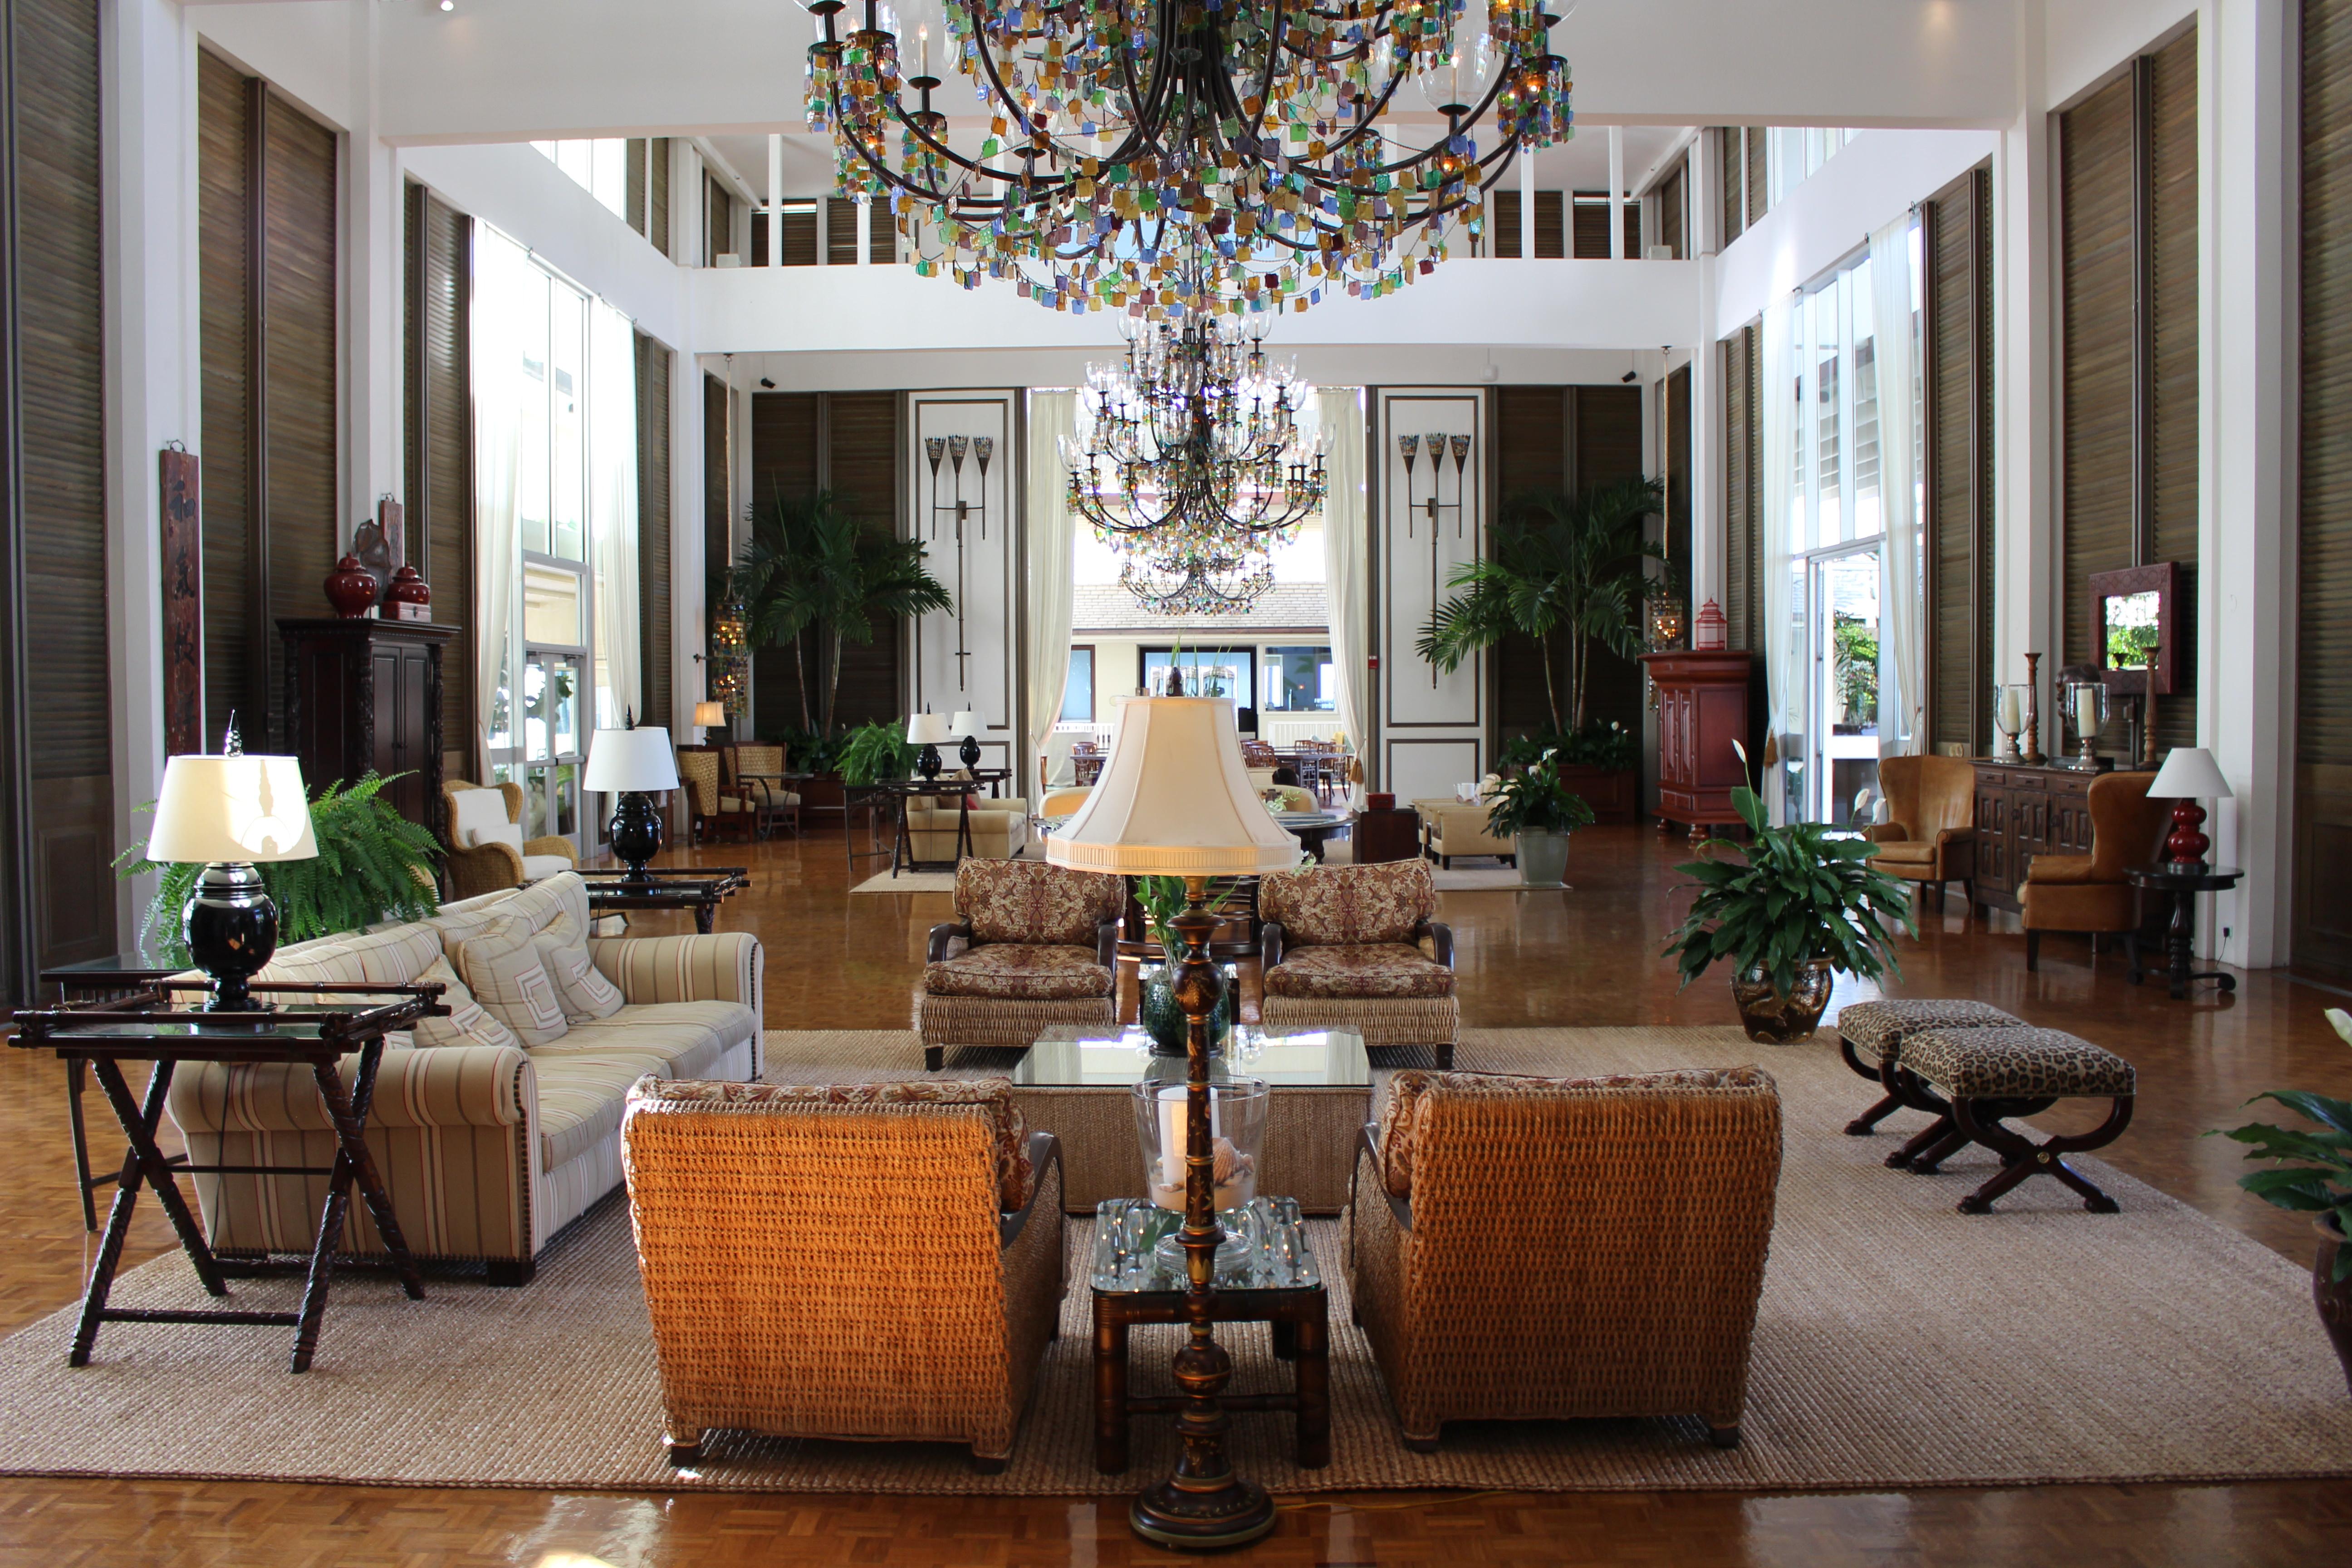 KAHALA HOTEL & RESORT, OAHU, HAWAII Review by John Pond | John Pond ...